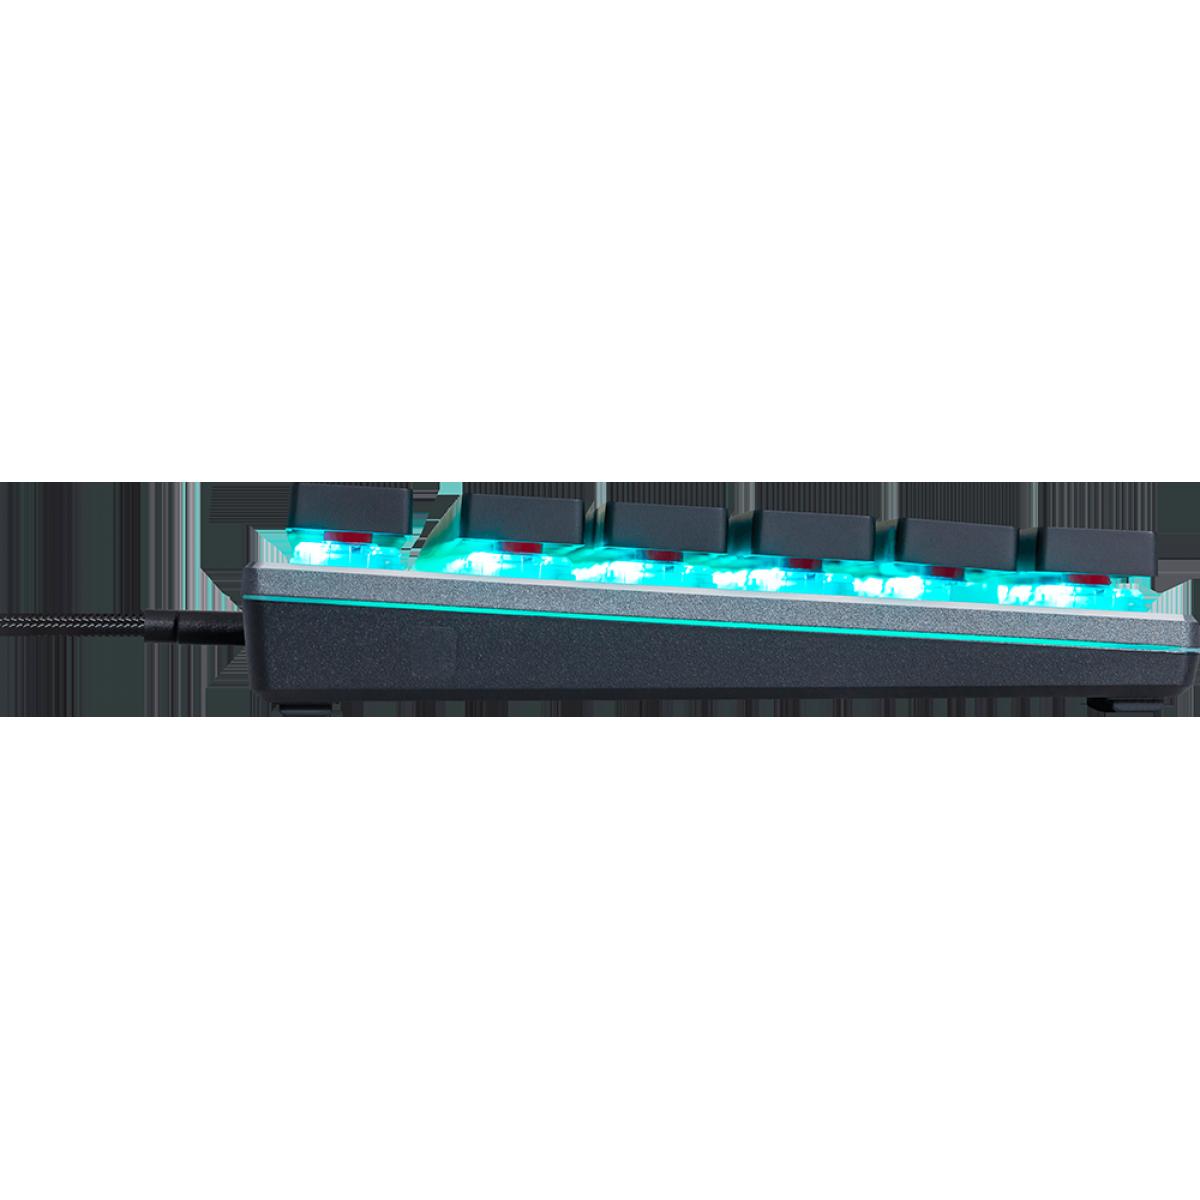 Teclado Gamer Mecânico Cooler Master SK630 RGB, Switch Low Profile Red, SK-630-GKLR1-PT